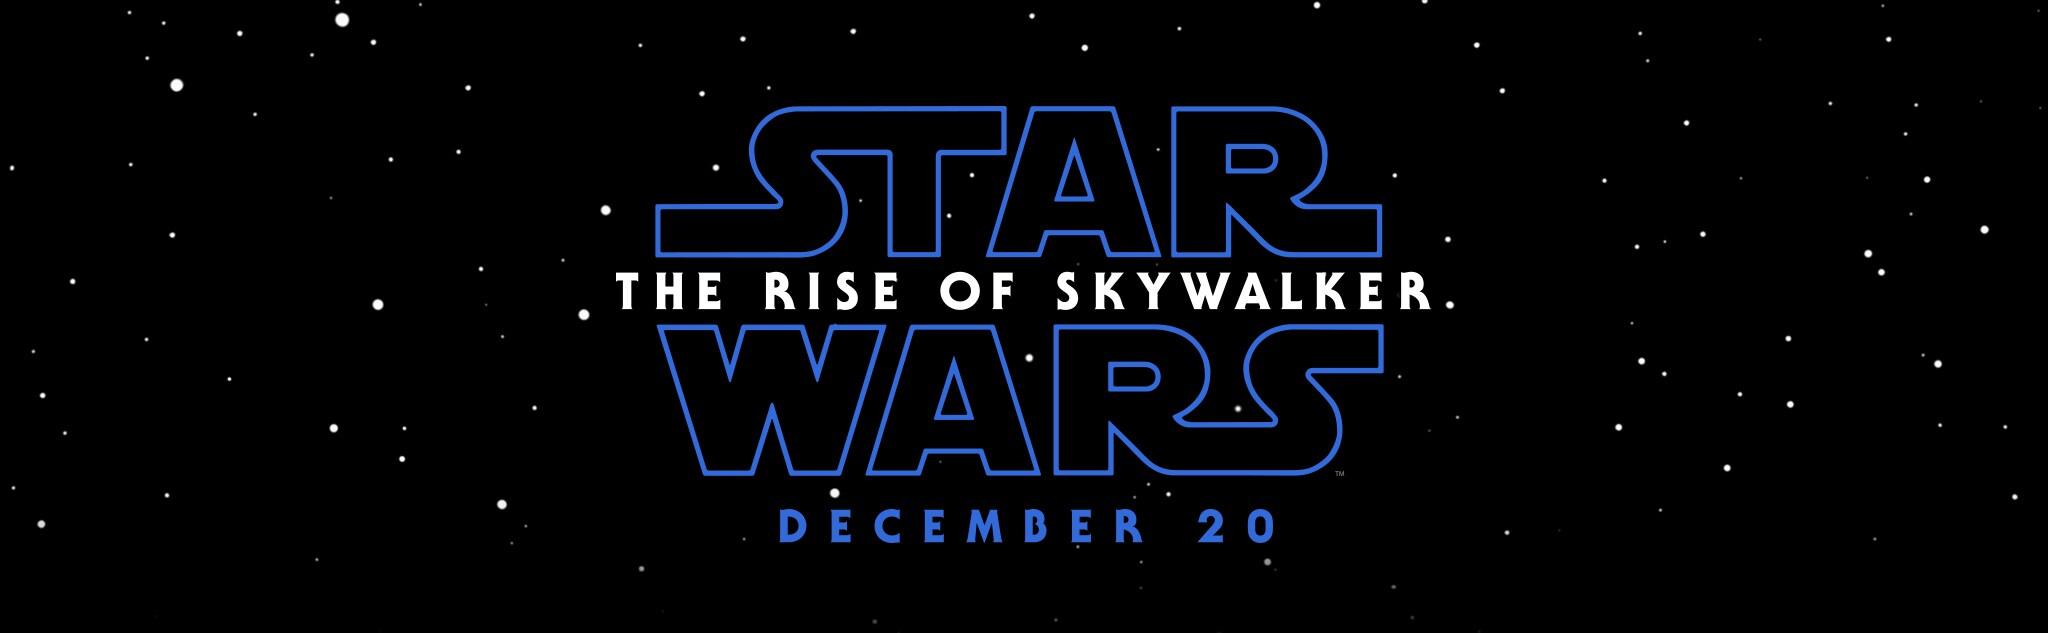 Star Wars: The Rise of Skywalker.  December 20.